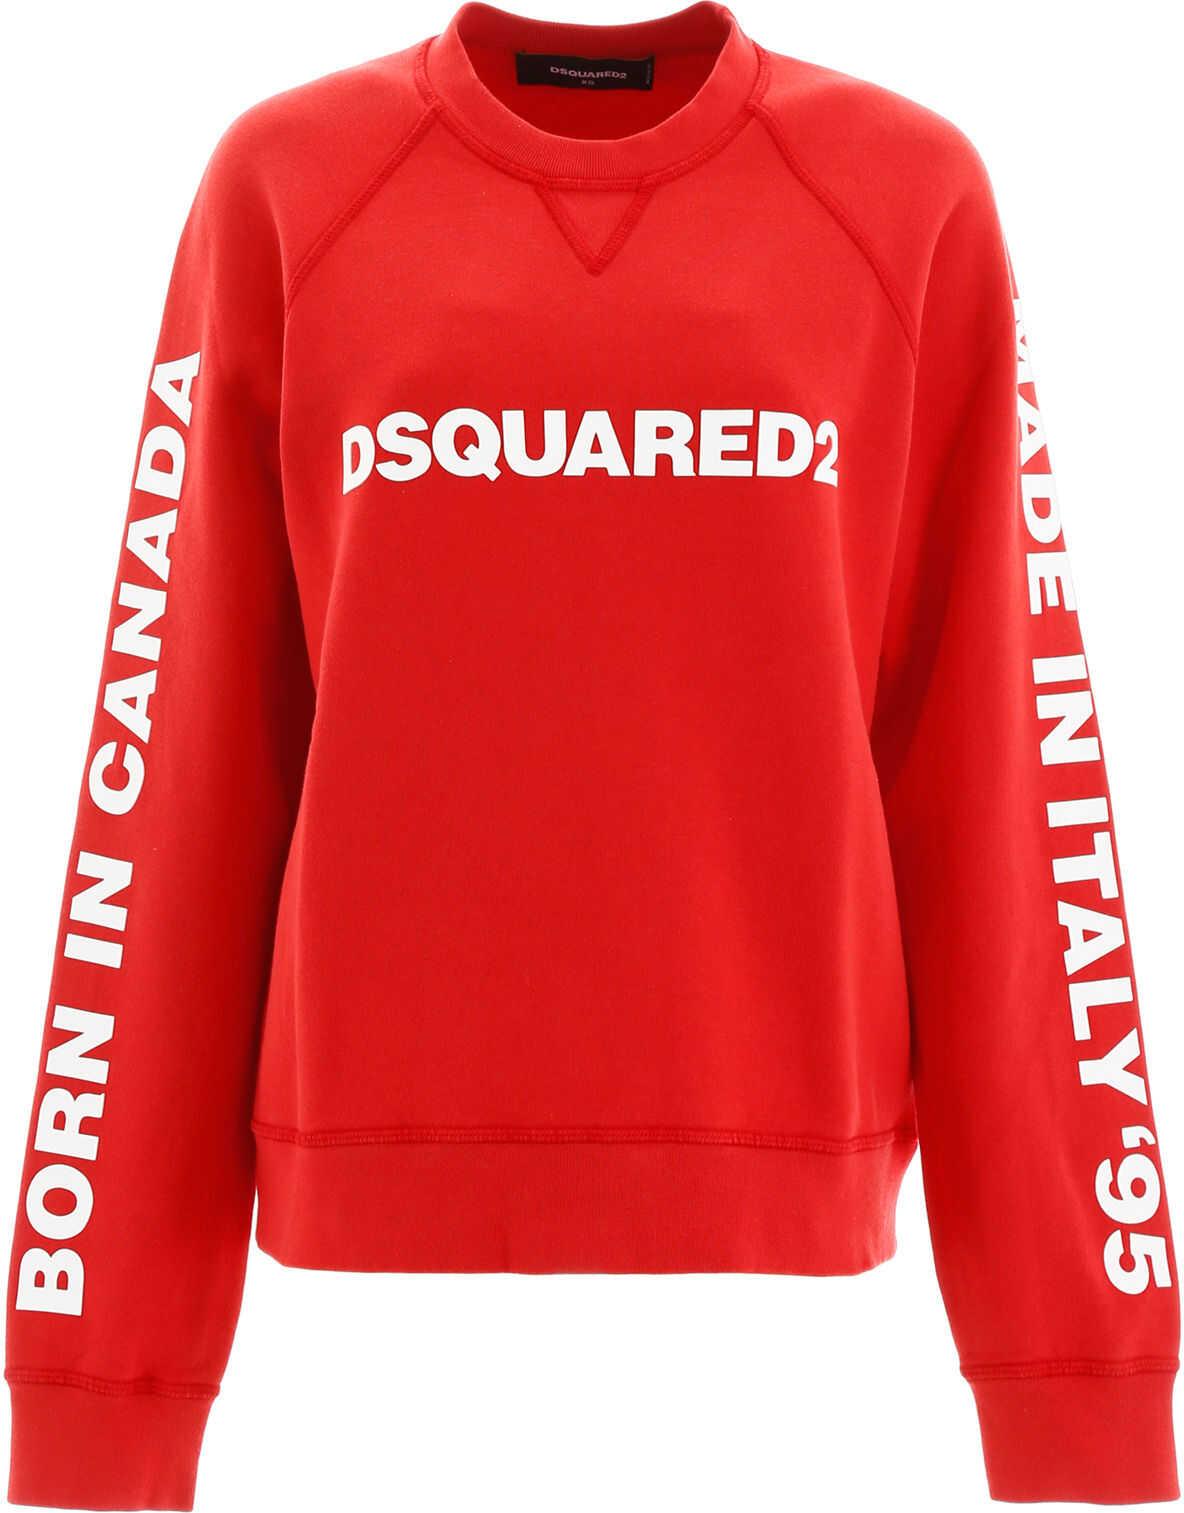 DSQUARED2 Printed Sweatshirt RED